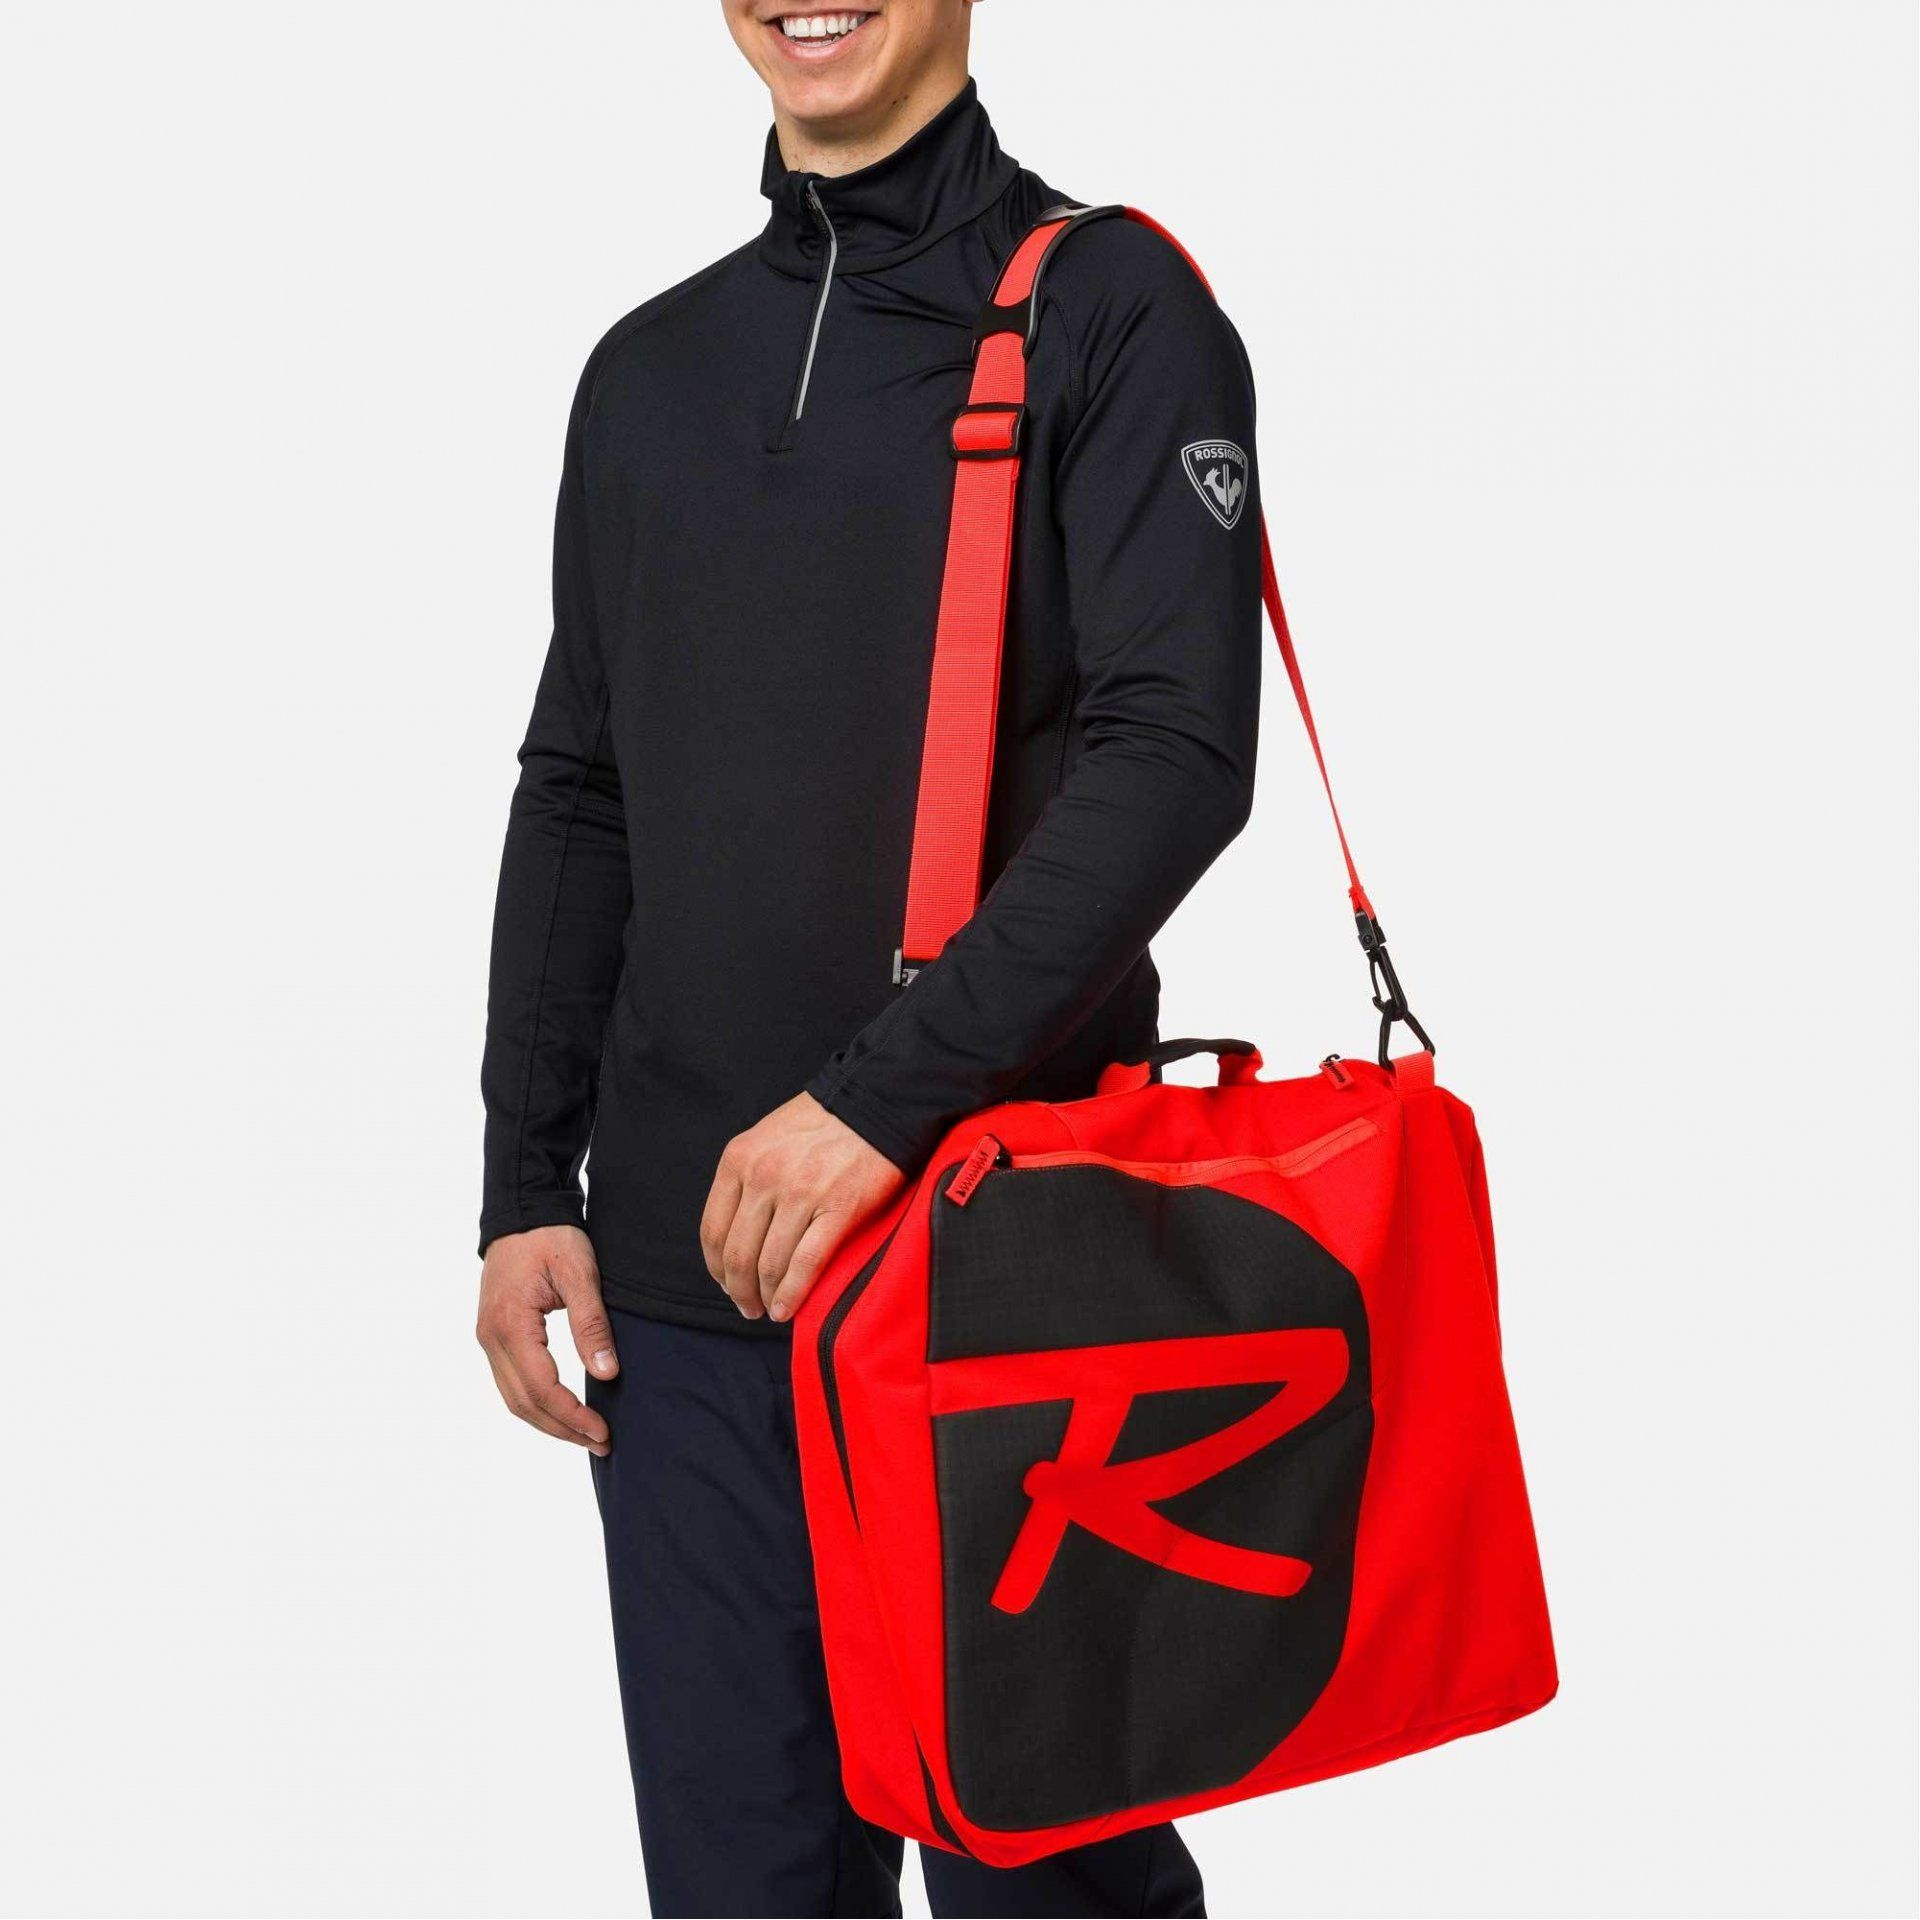 TORBA NA BUTY ROSSIGNOL HERO DUAL BOOT BAG RKHB108 4